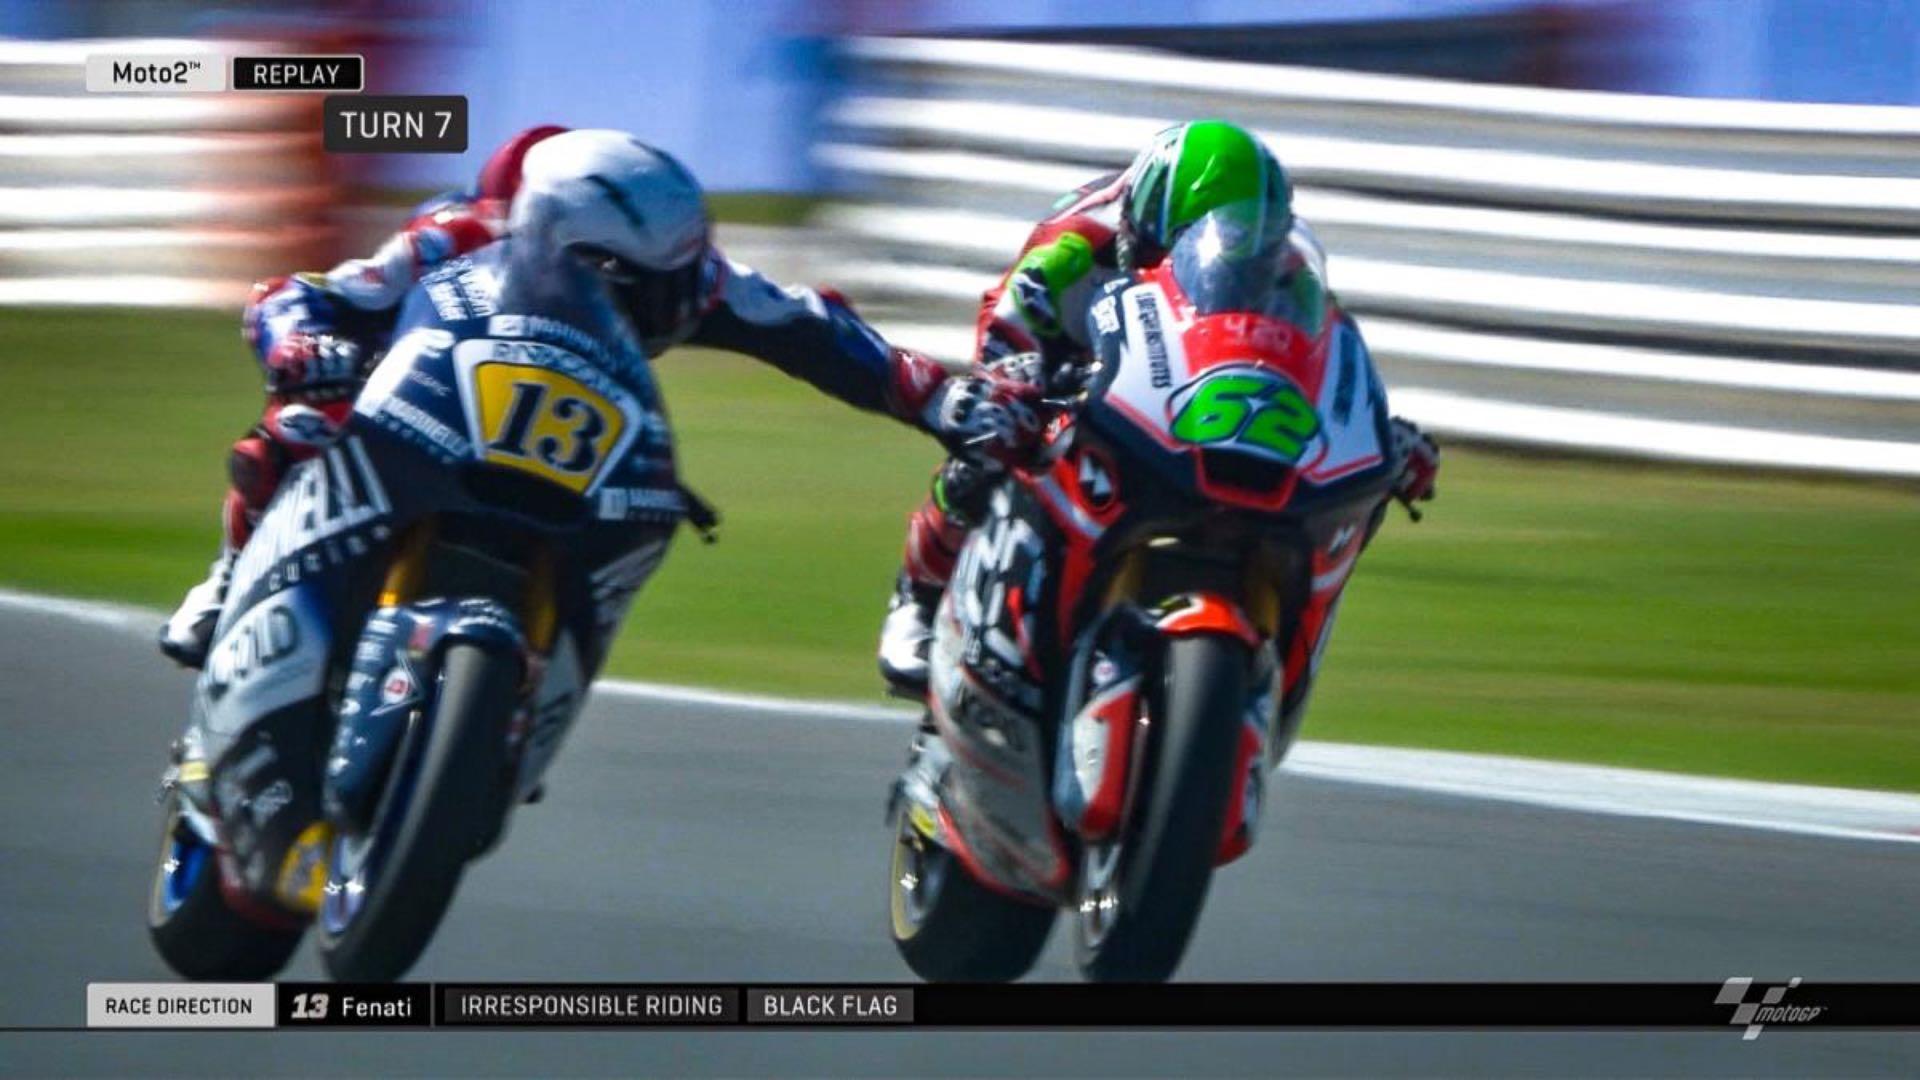 Romano Fenati Loses FIM Motorcycle Racing License